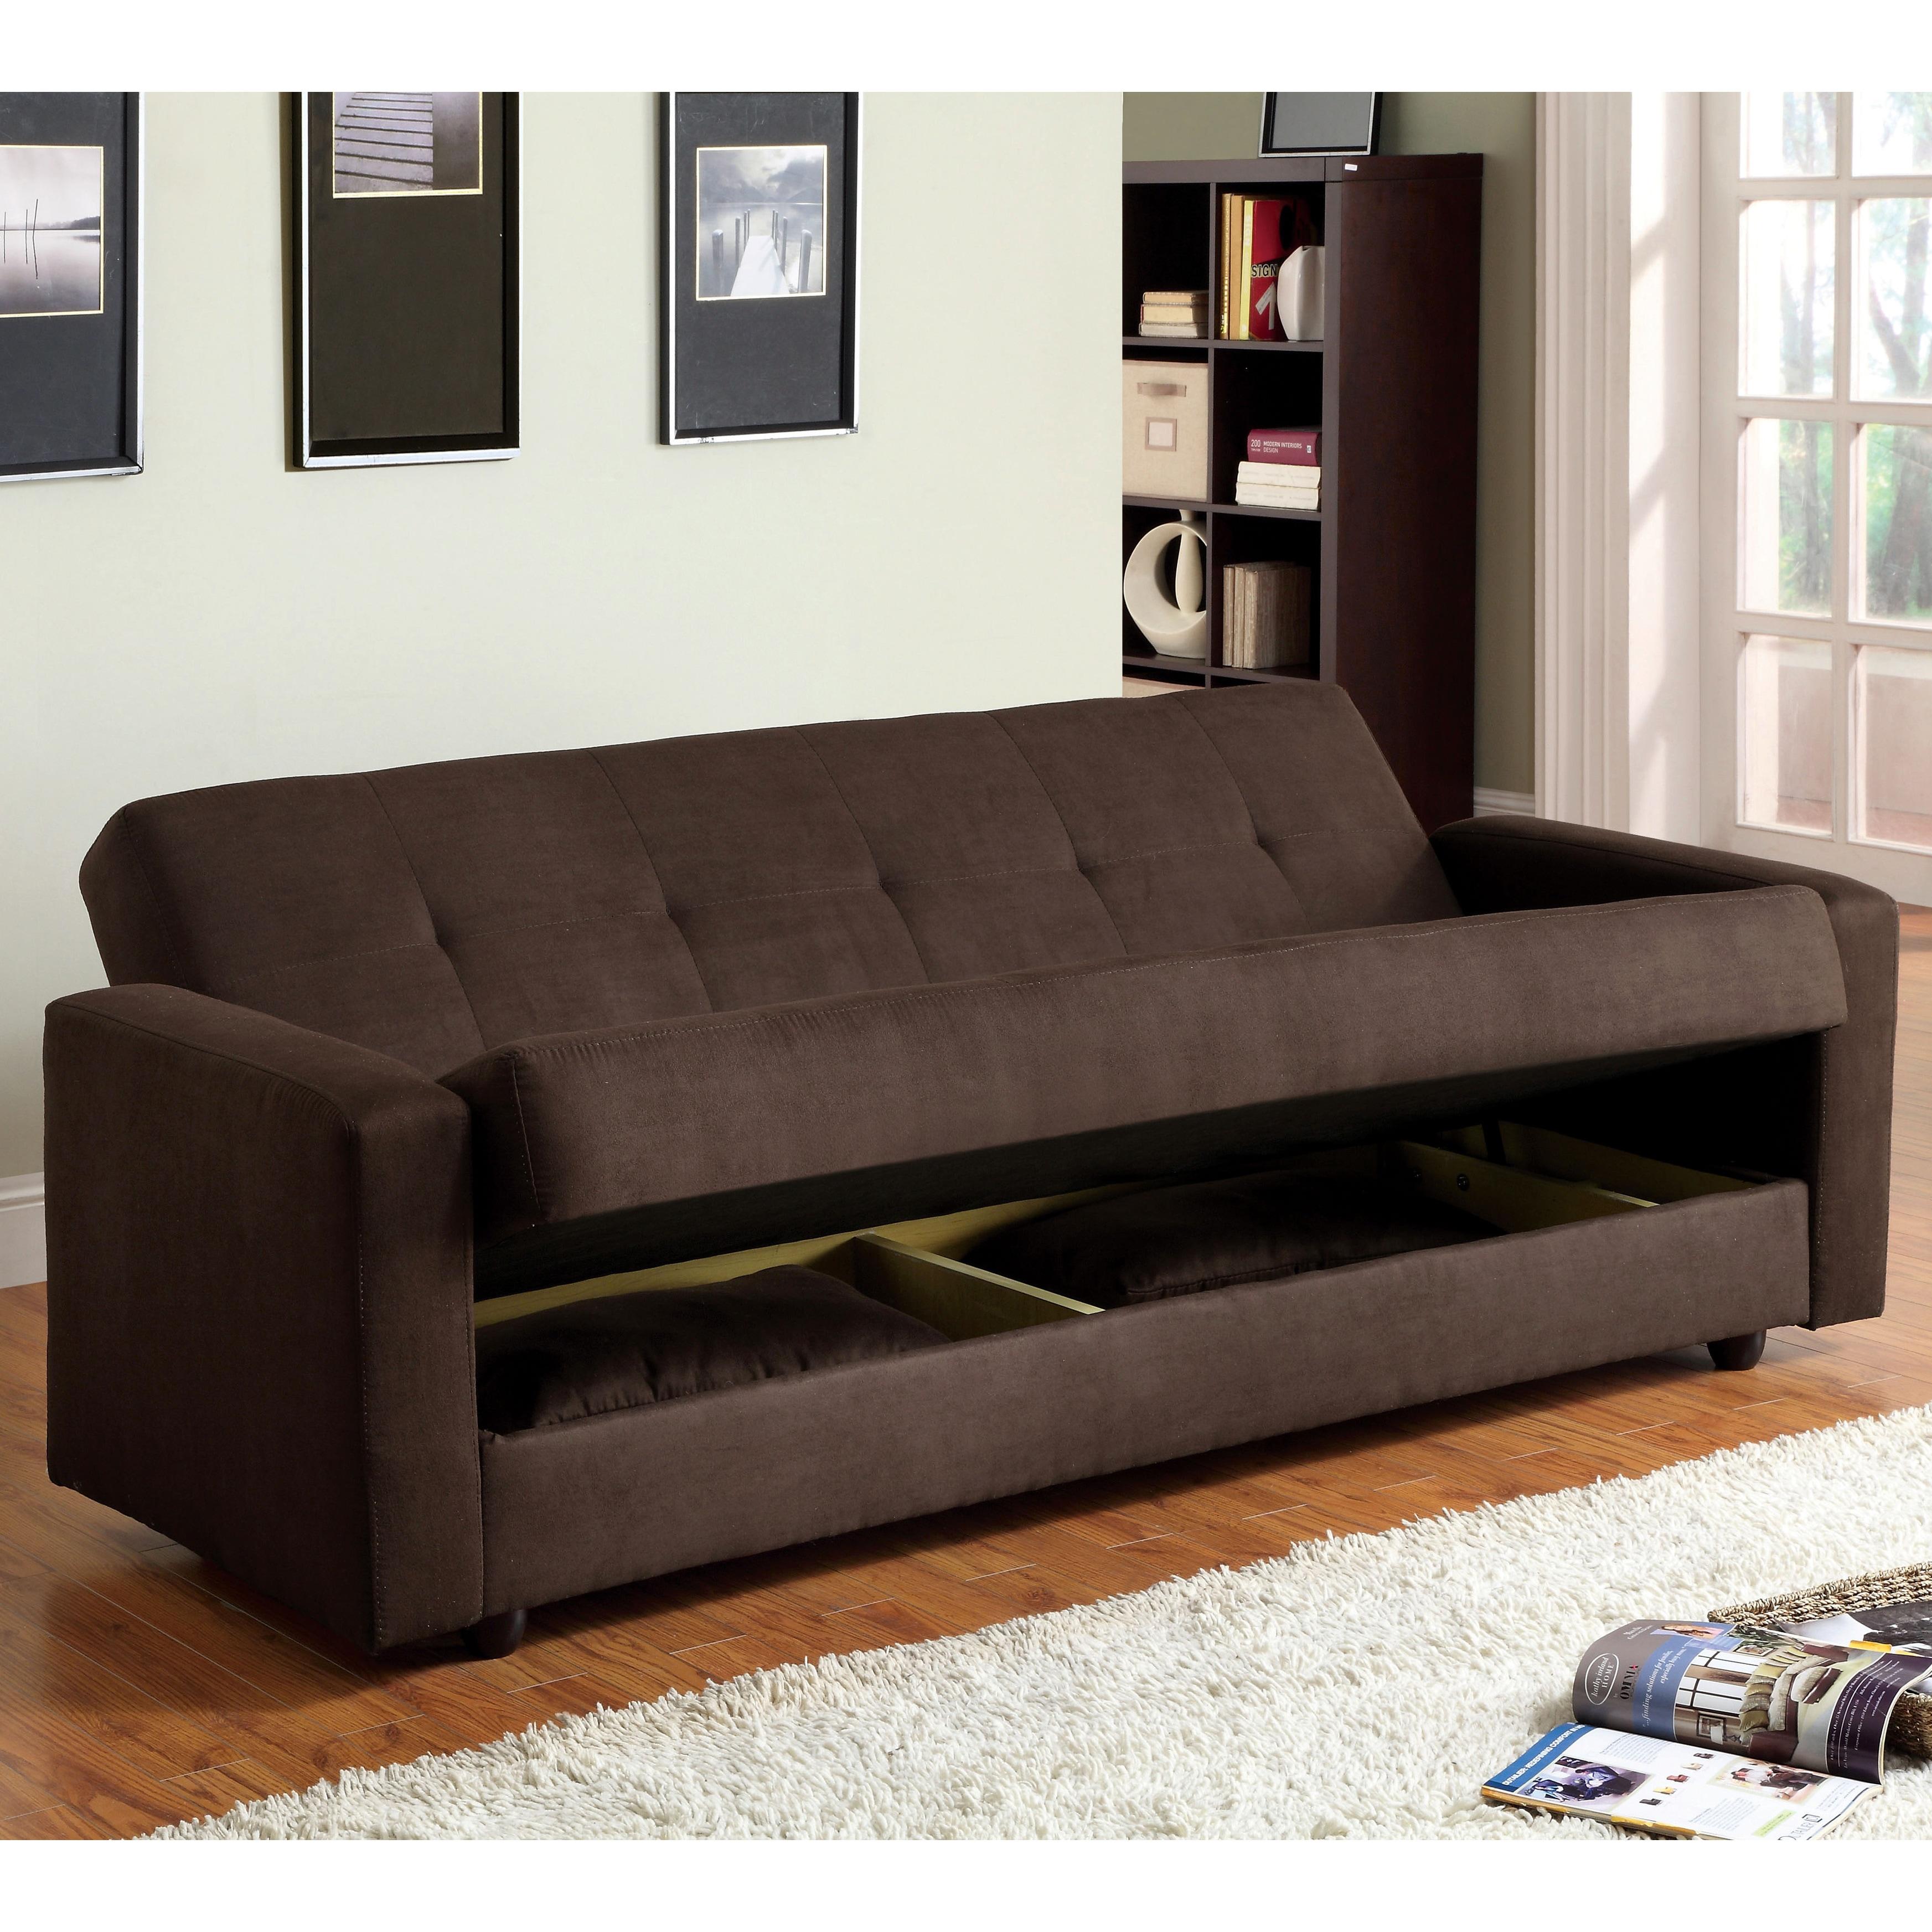 Furniture of America Cozy Microfiber Futon Sofa Bed with Storage